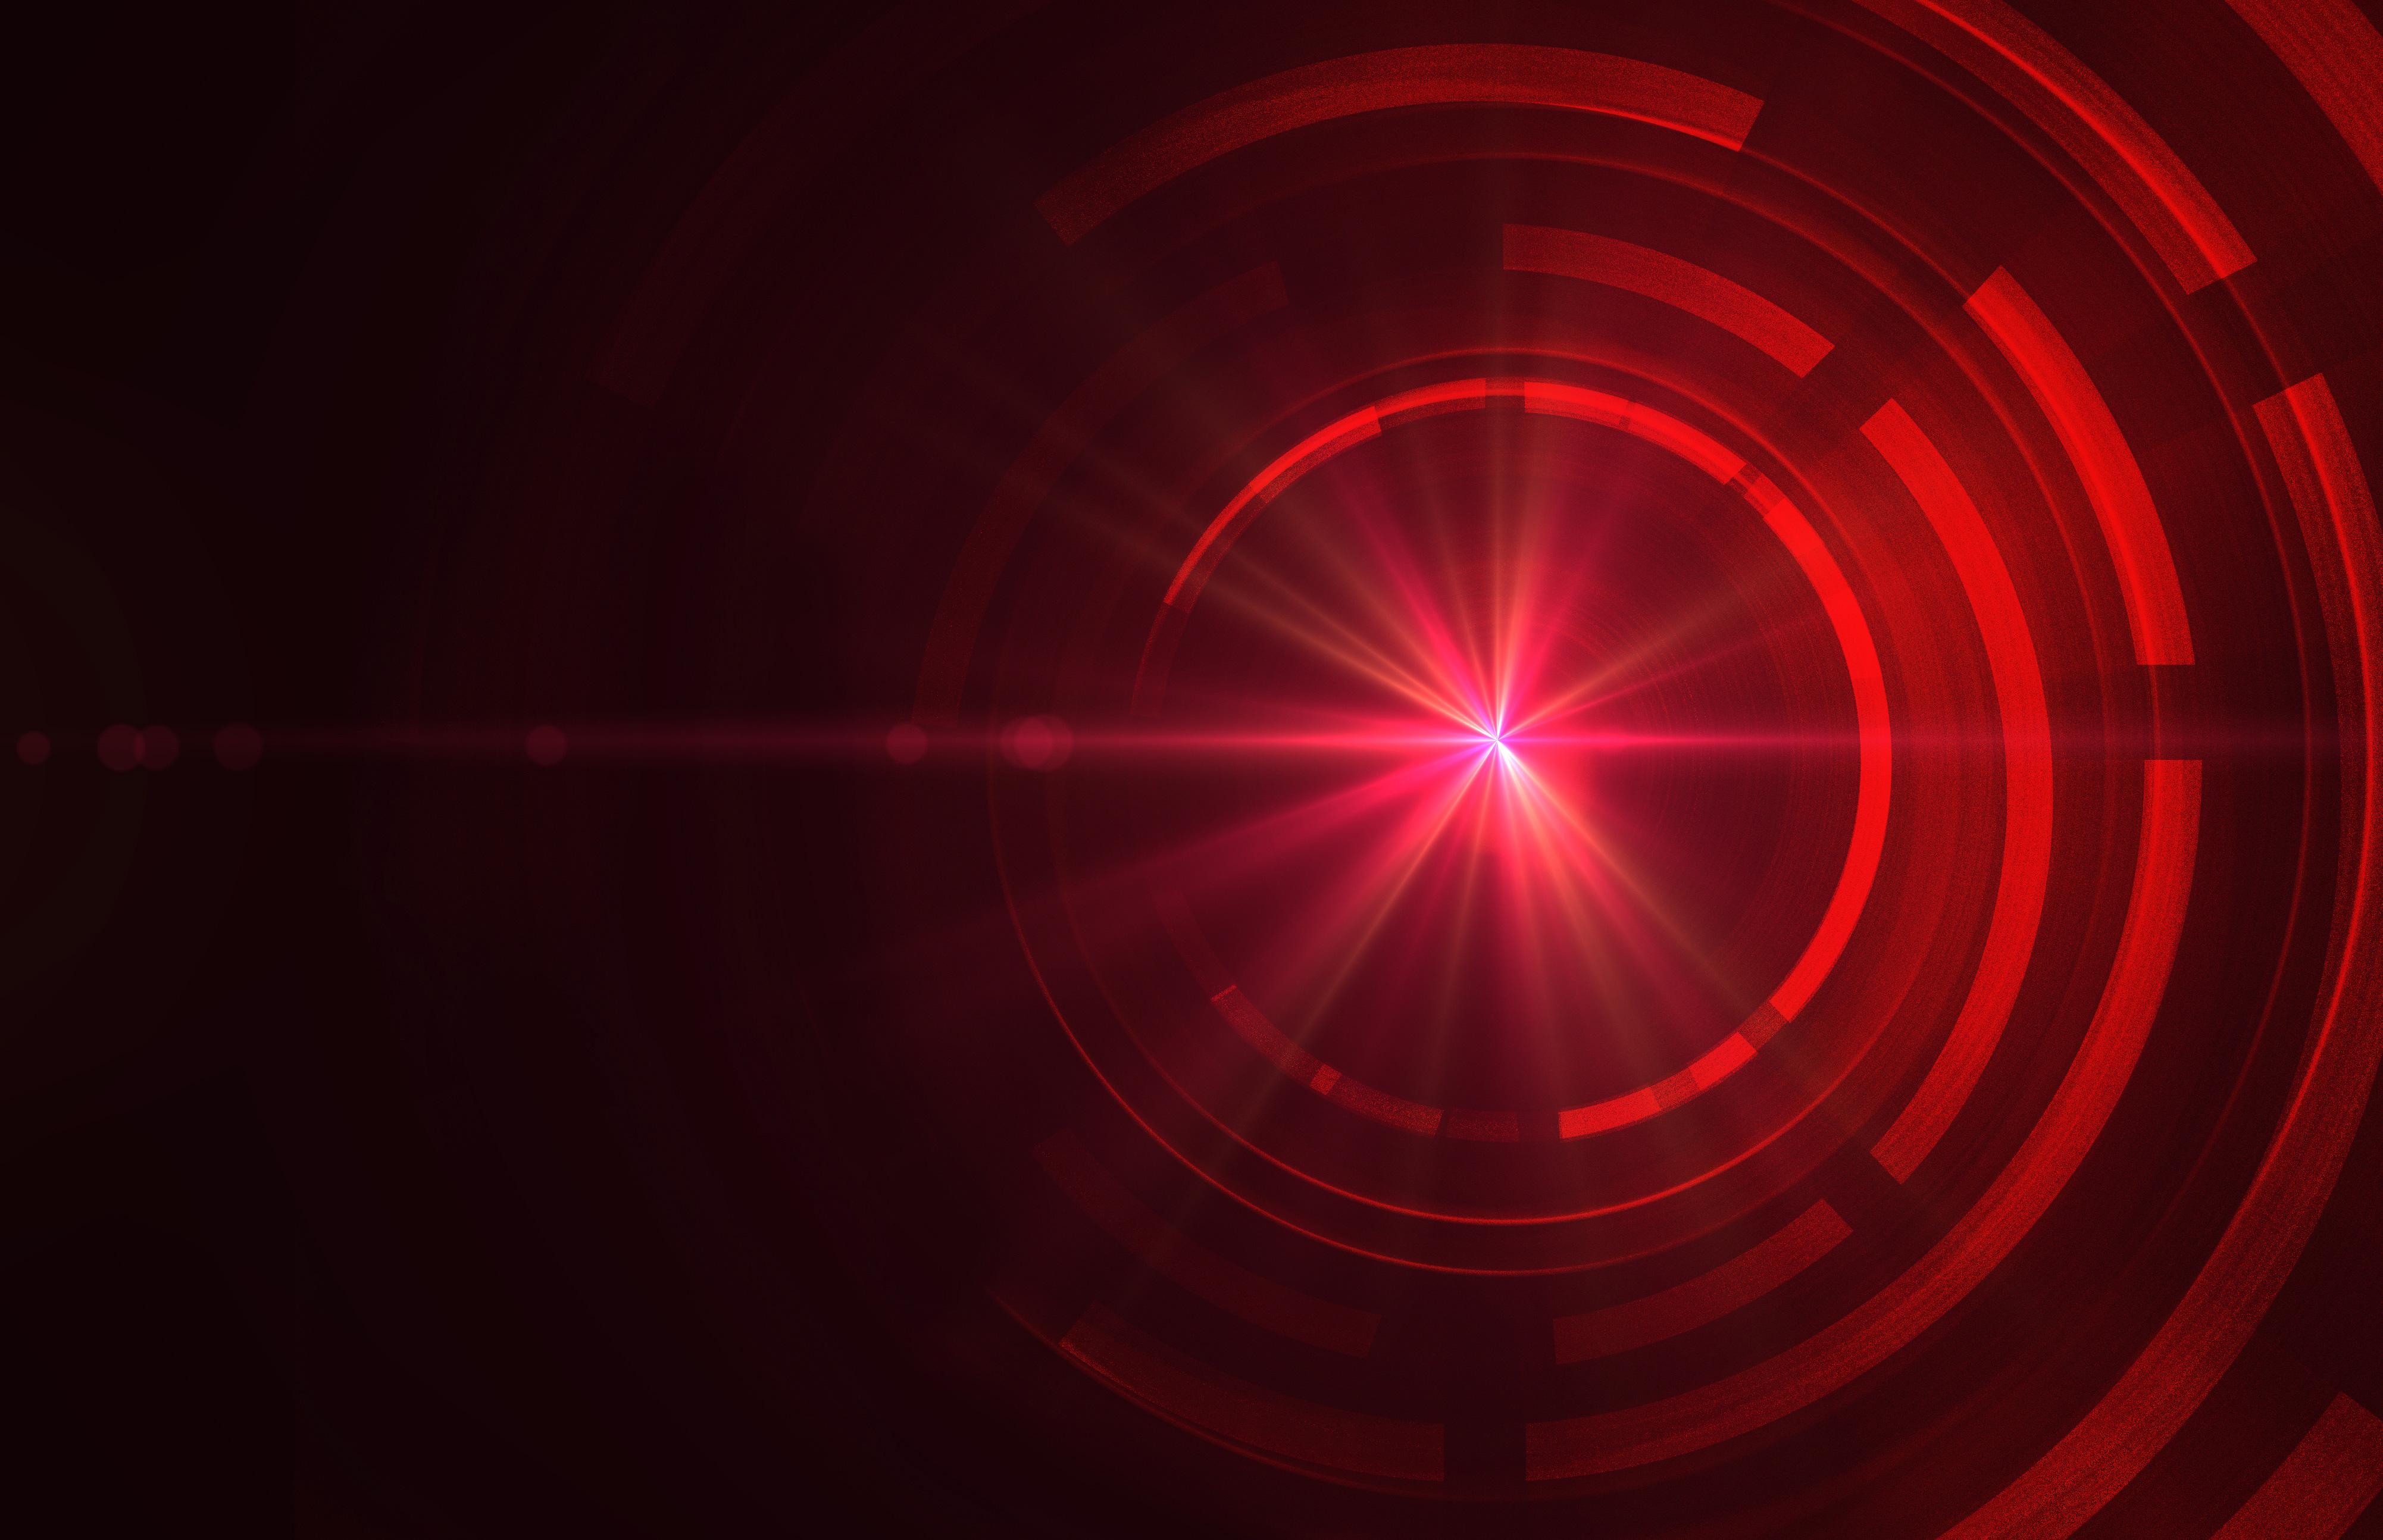 2560x1080 Red Diamond Shine Abstract 4k 2560x1080 ...